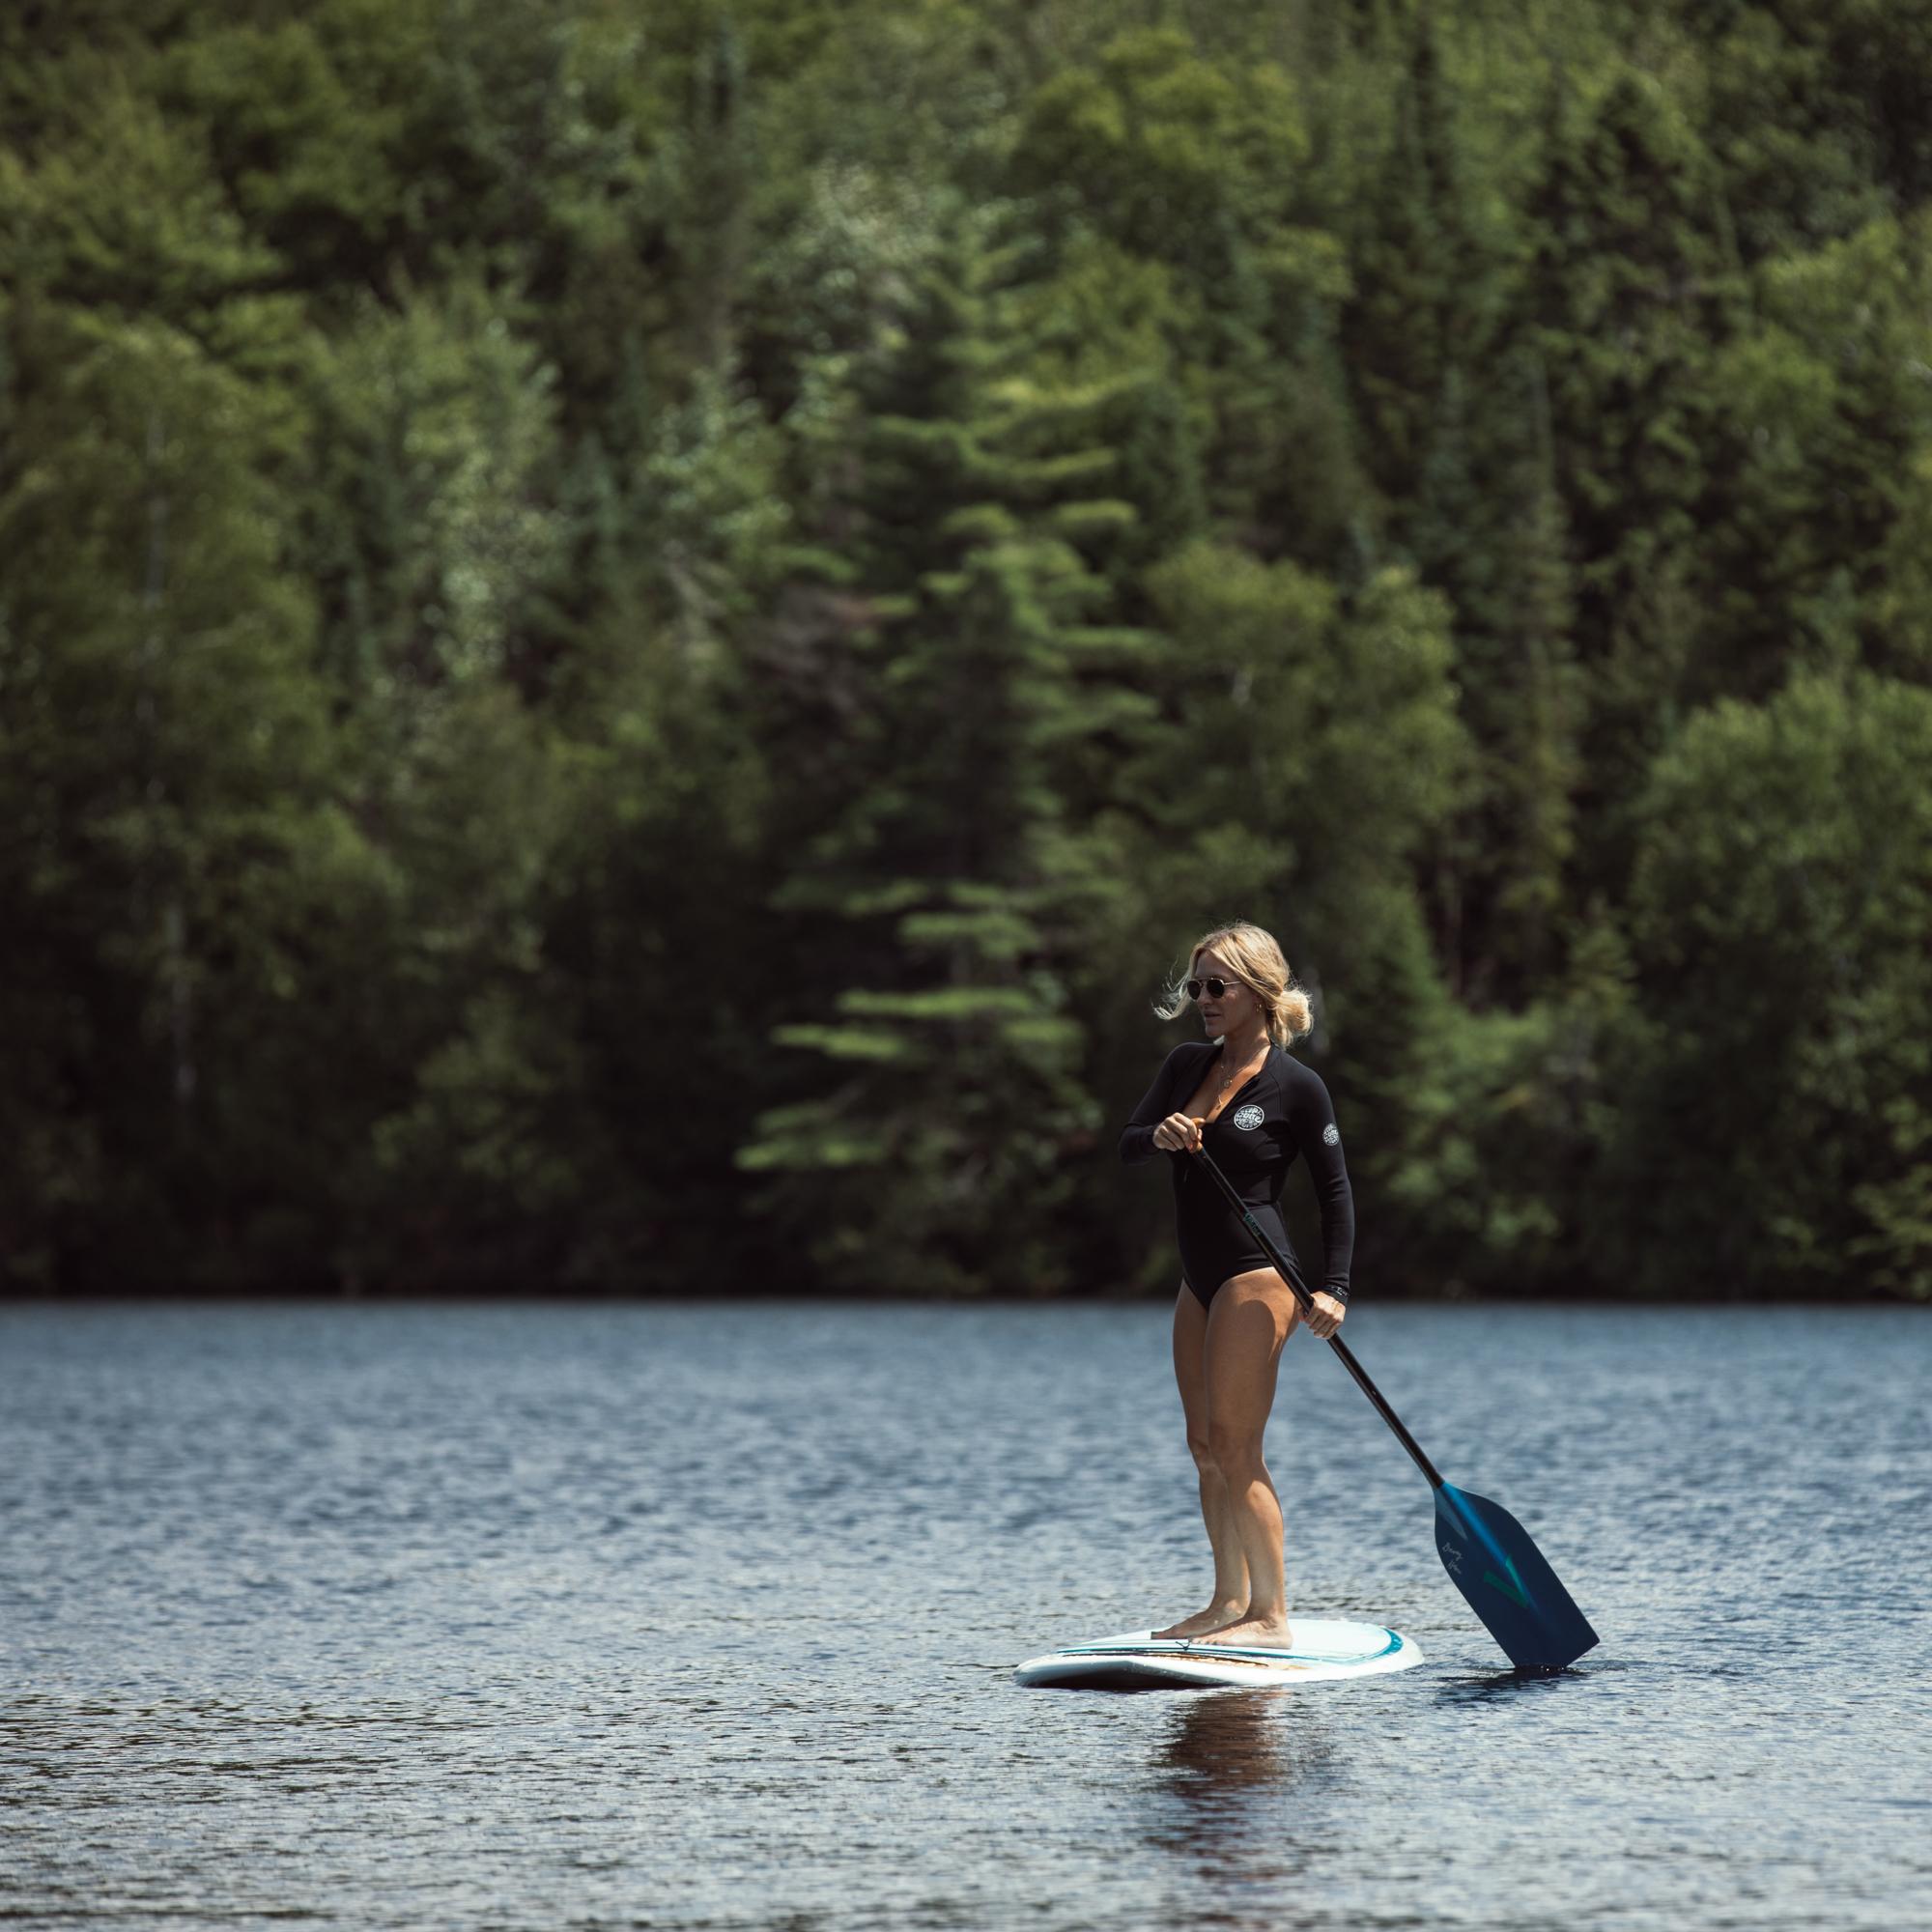 paddle board 1.jpg